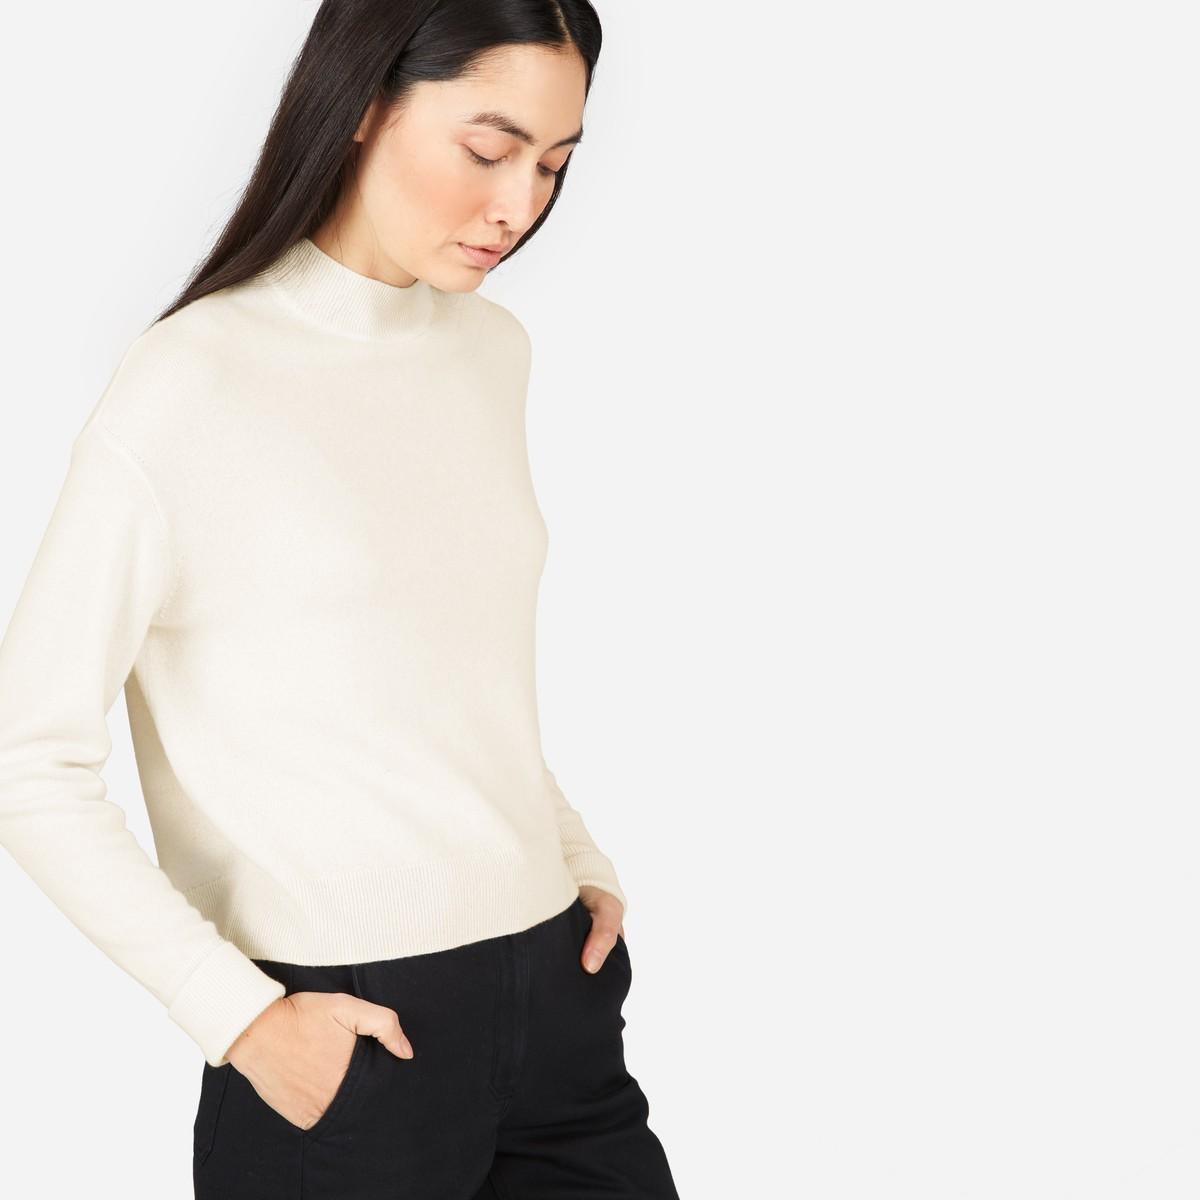 streetstyle9sweater.jpg